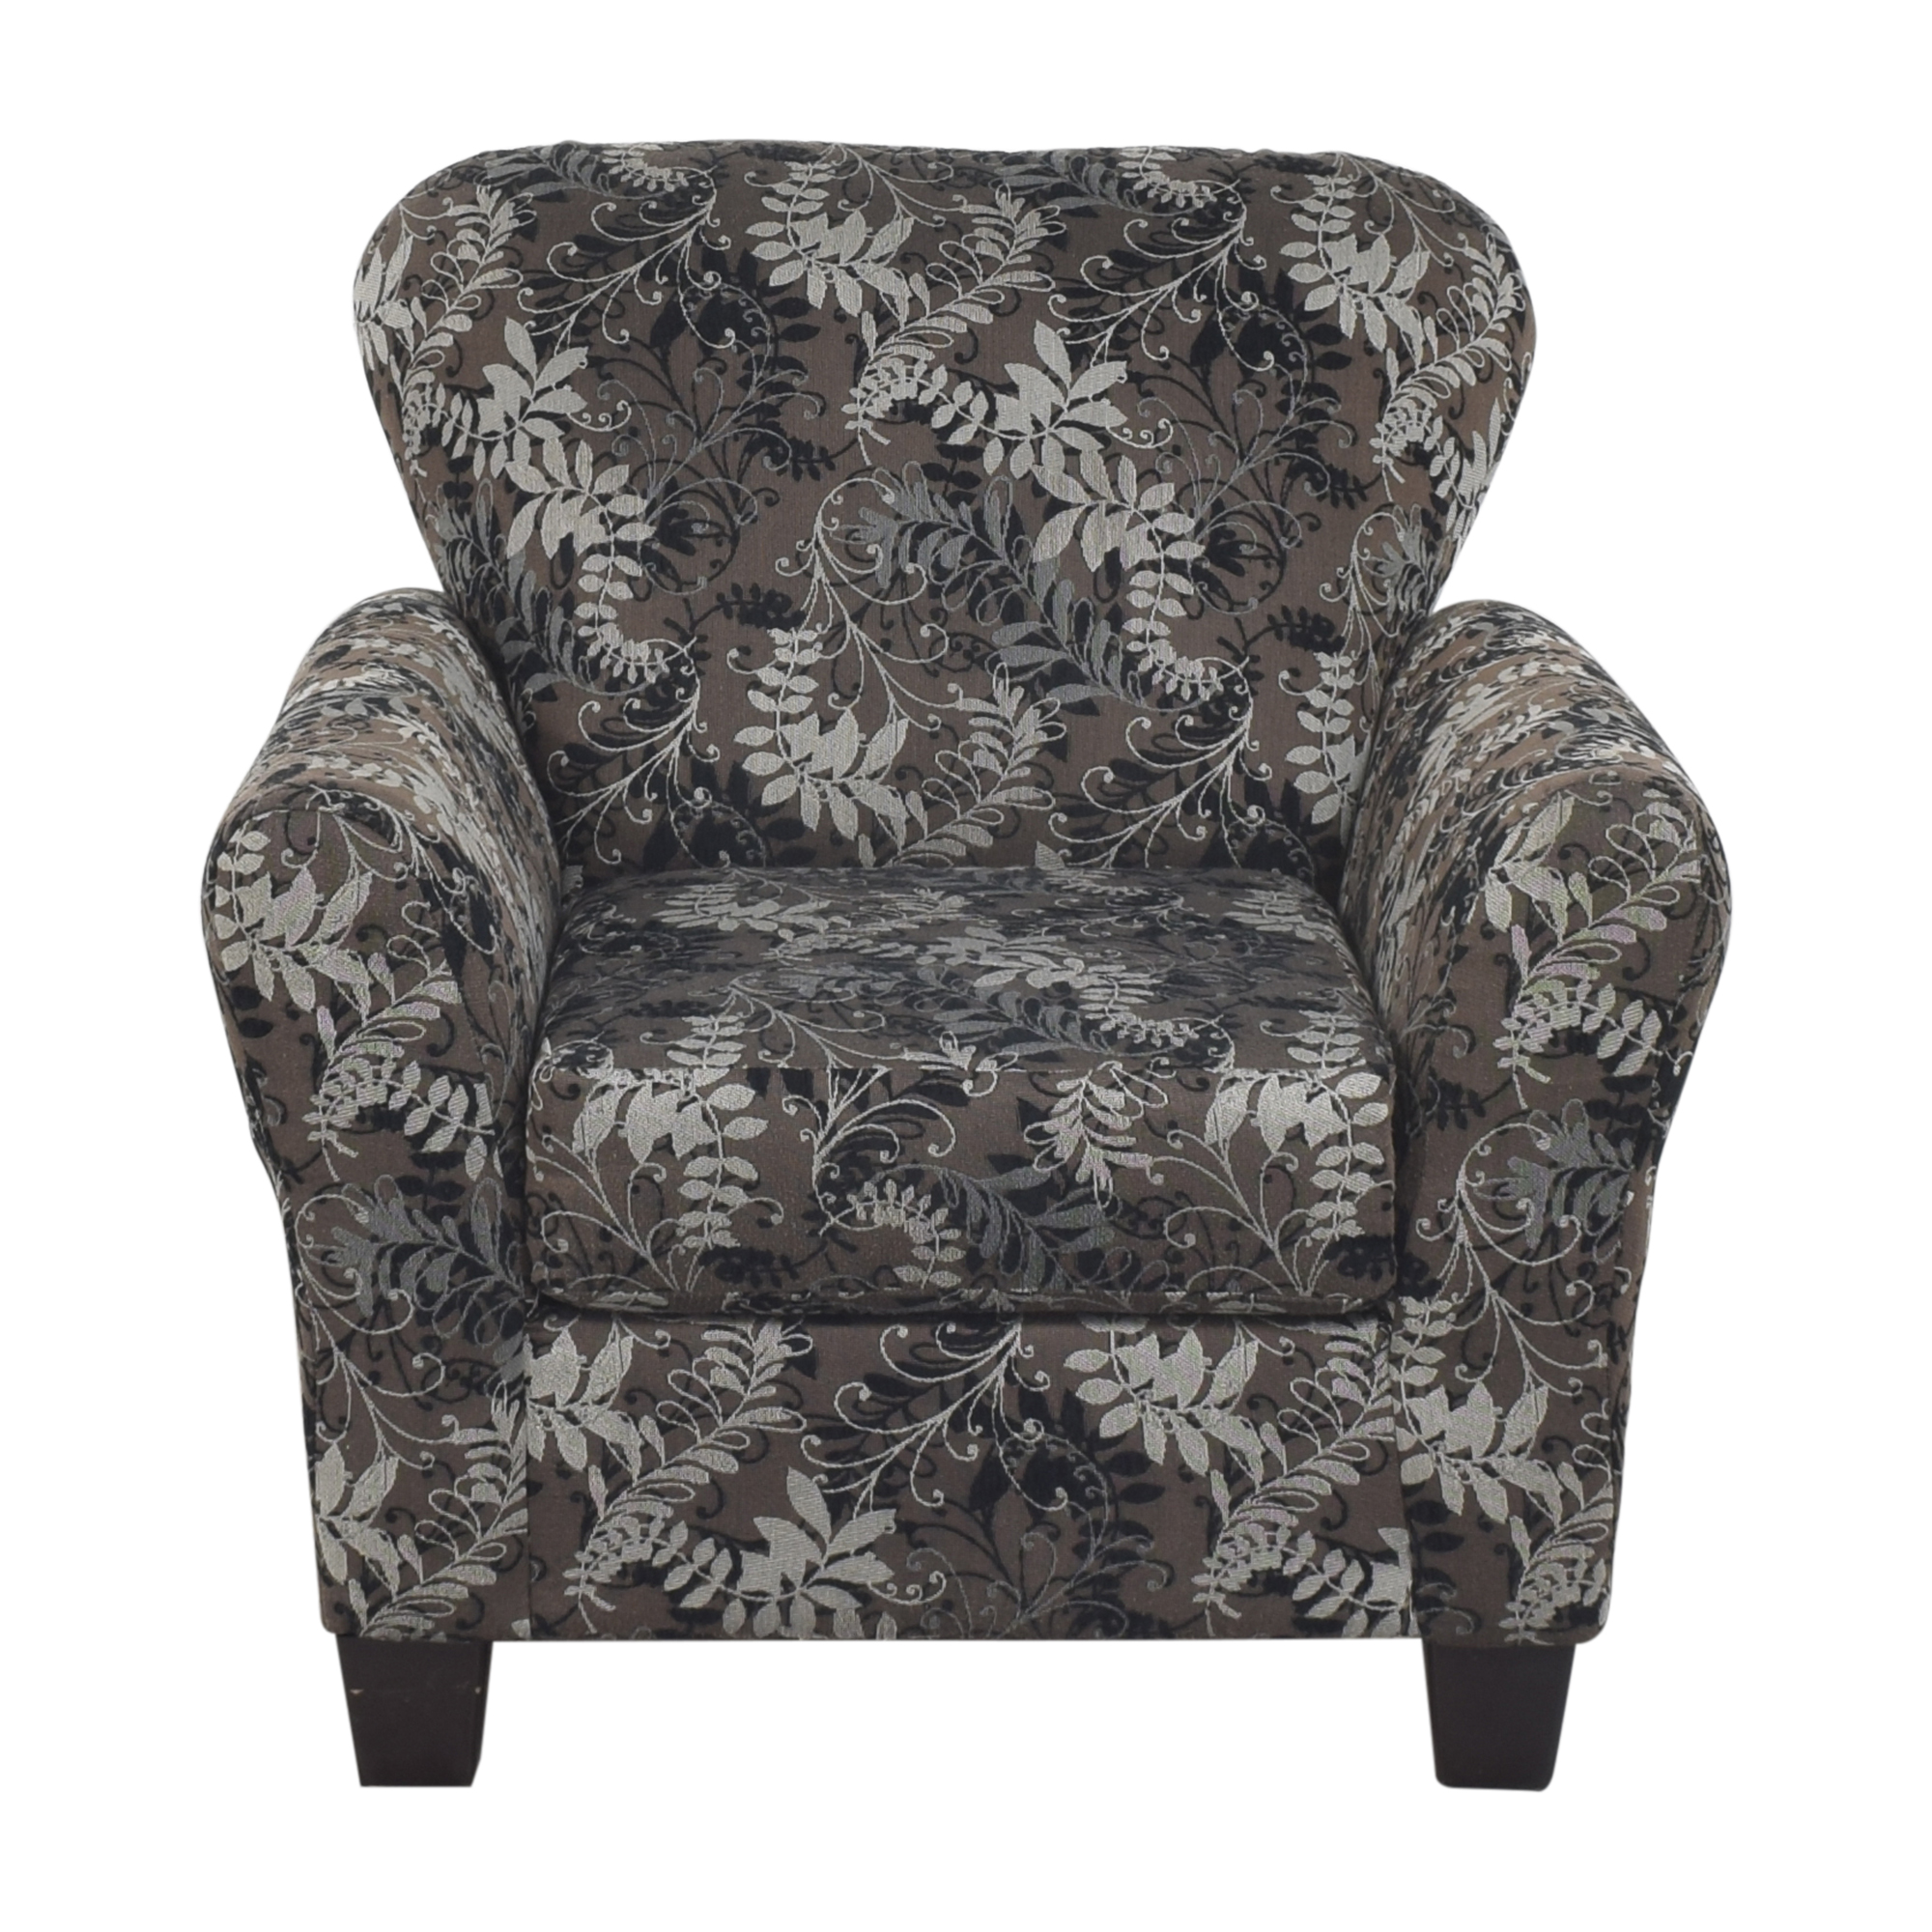 Raymour & Flanigan Raymour & Flanigan Hartley Accent Chair nj